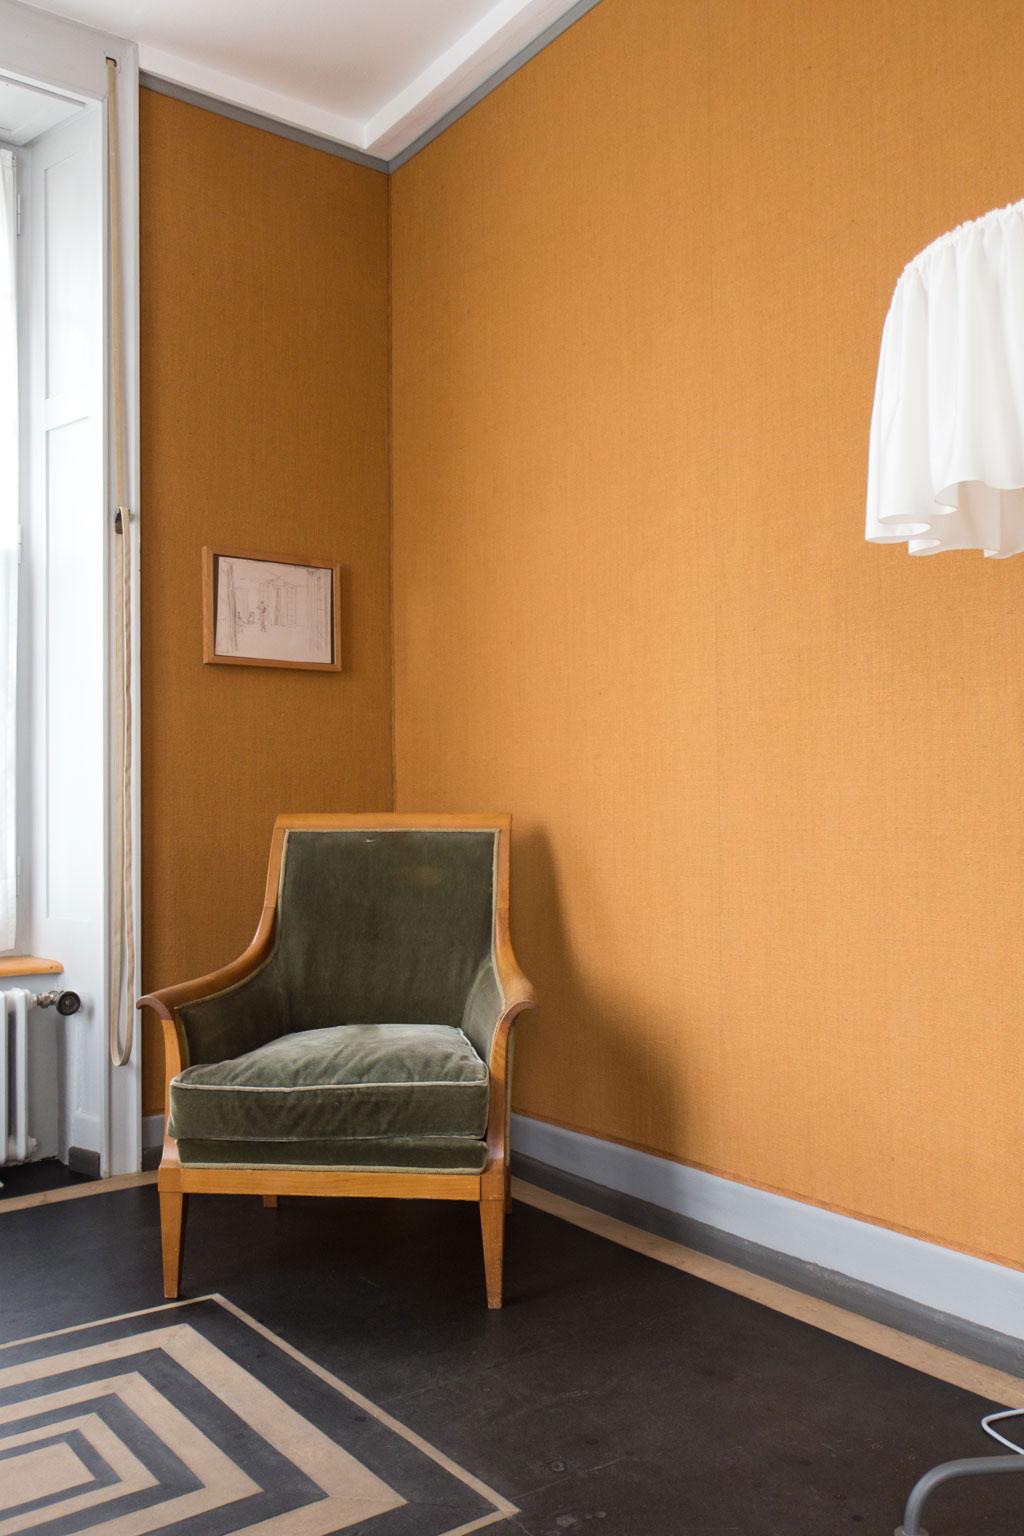 Schweiz Jura – Le Corbusier – La Maison blanche – Sessel und Stehlampe | SOMEWHERE ELSE